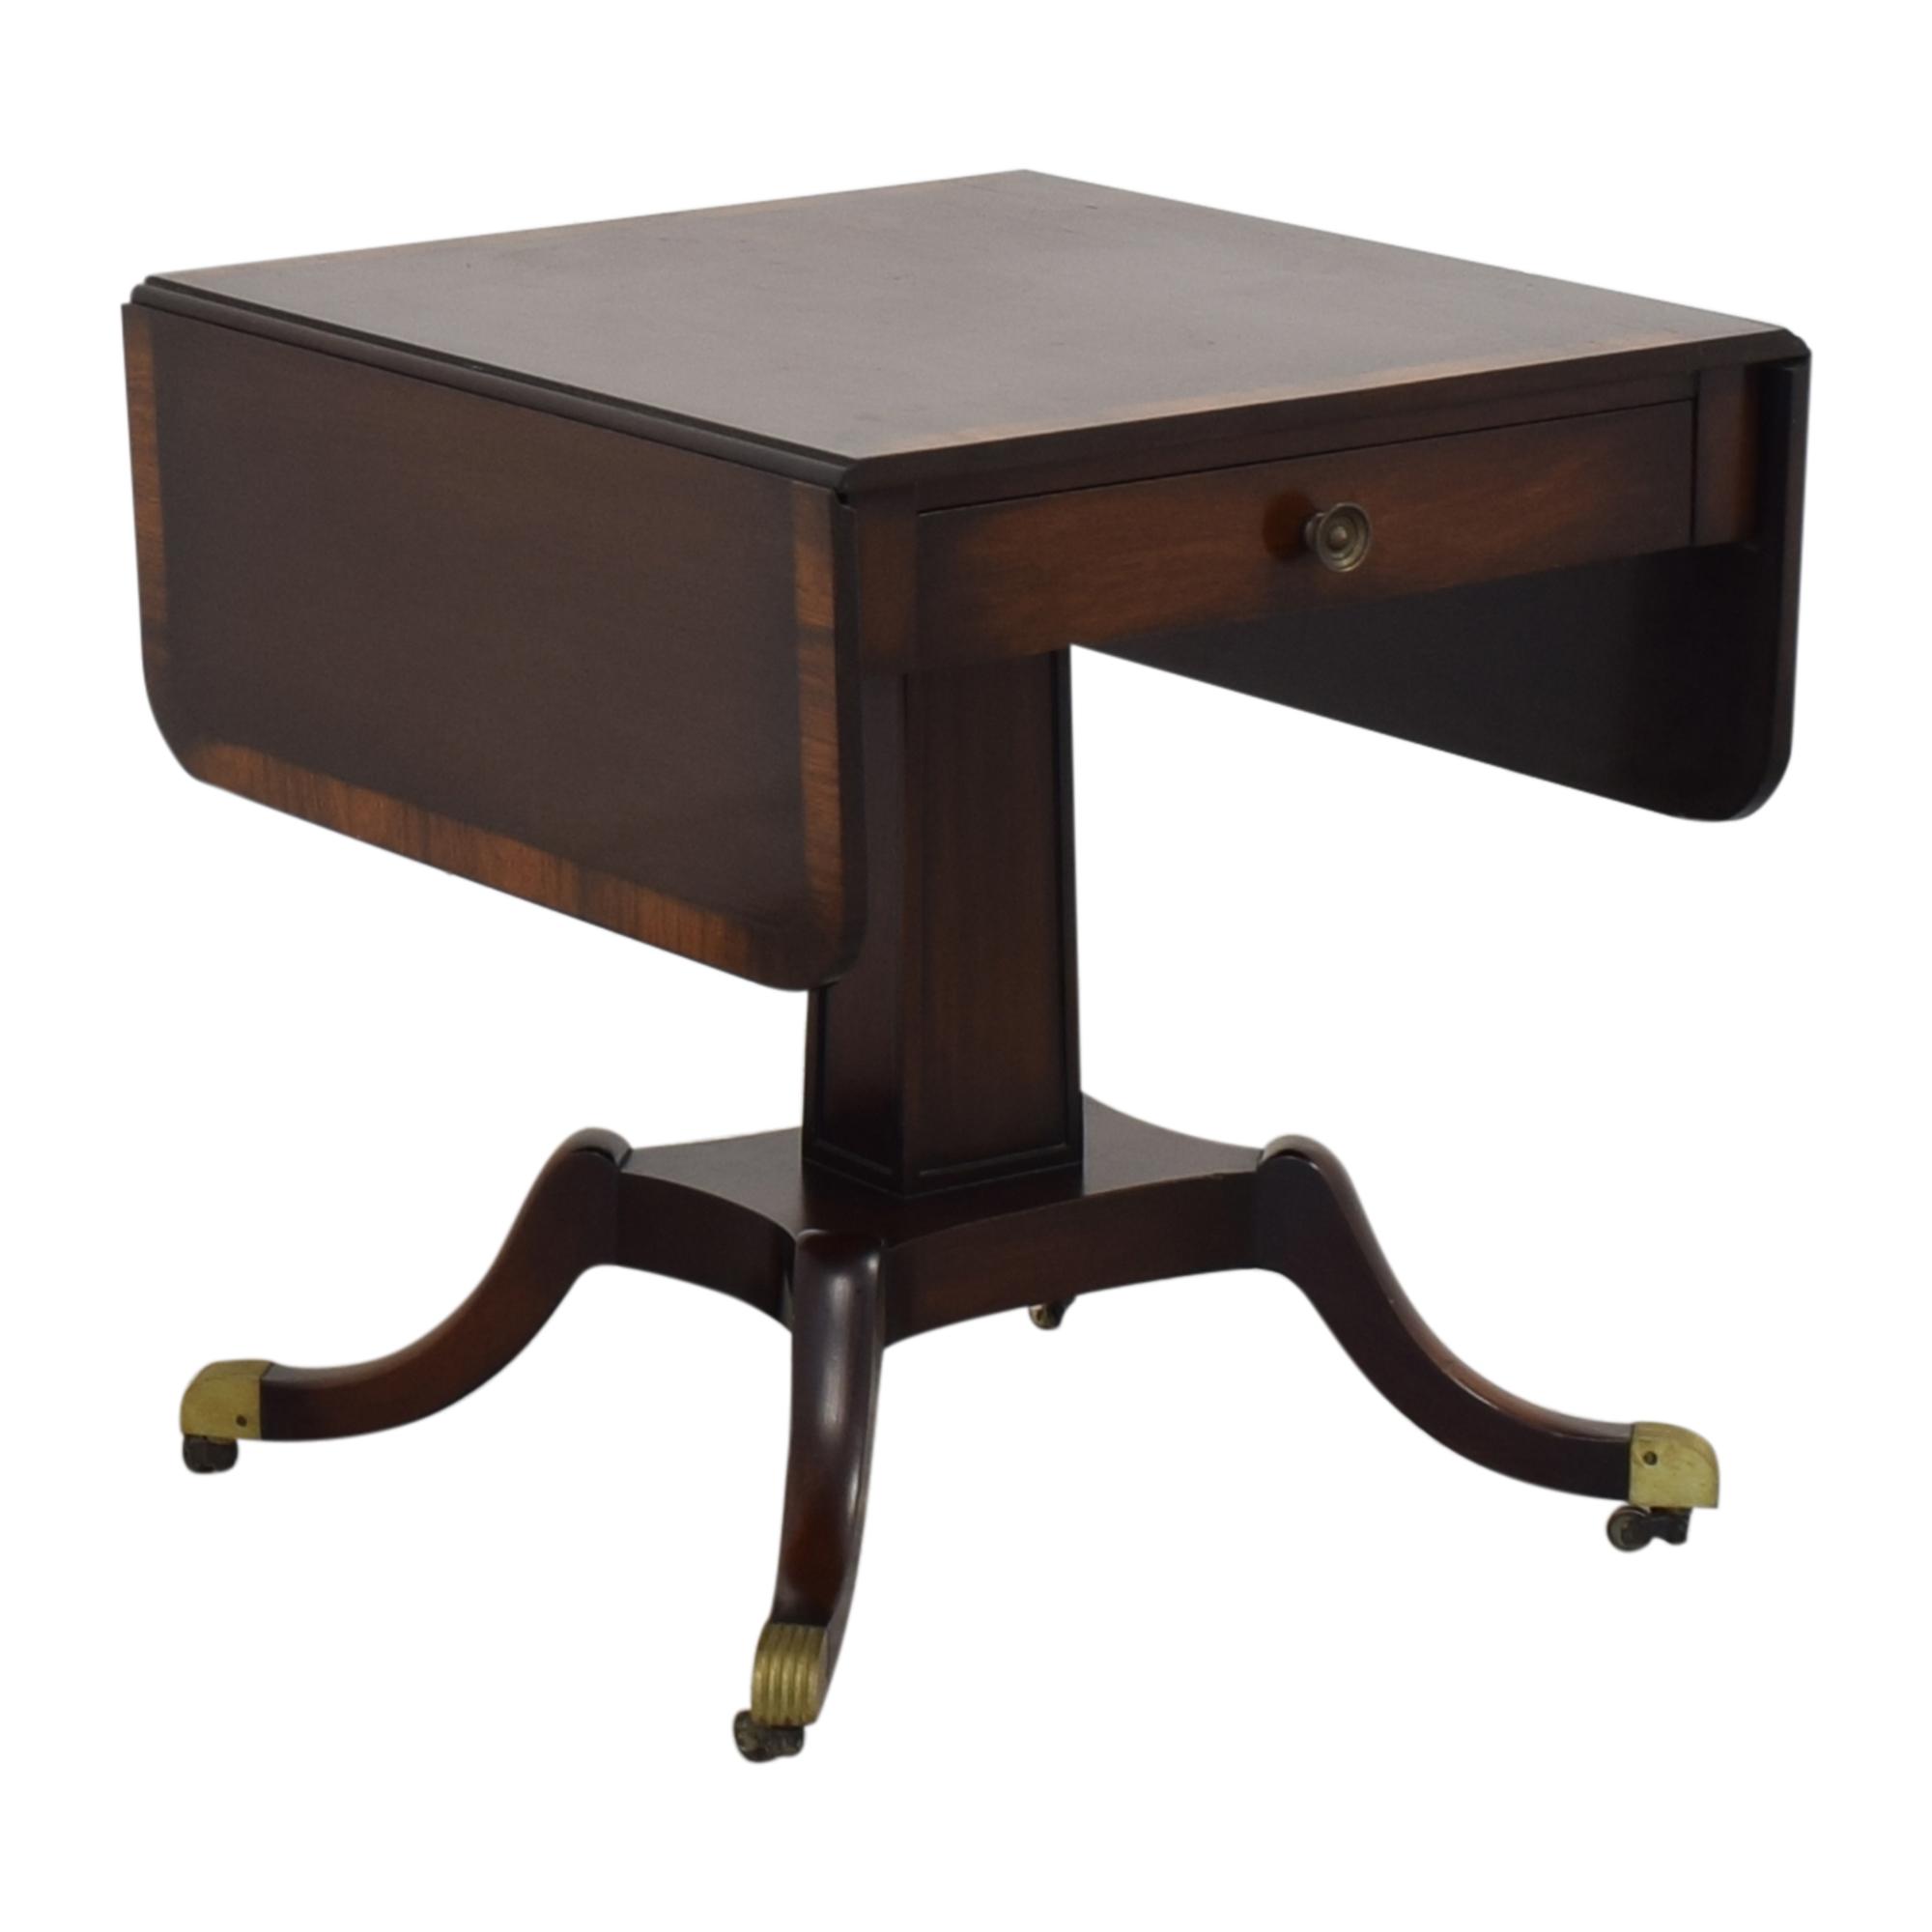 Vintage Federal Style Drop Leaf Table ct